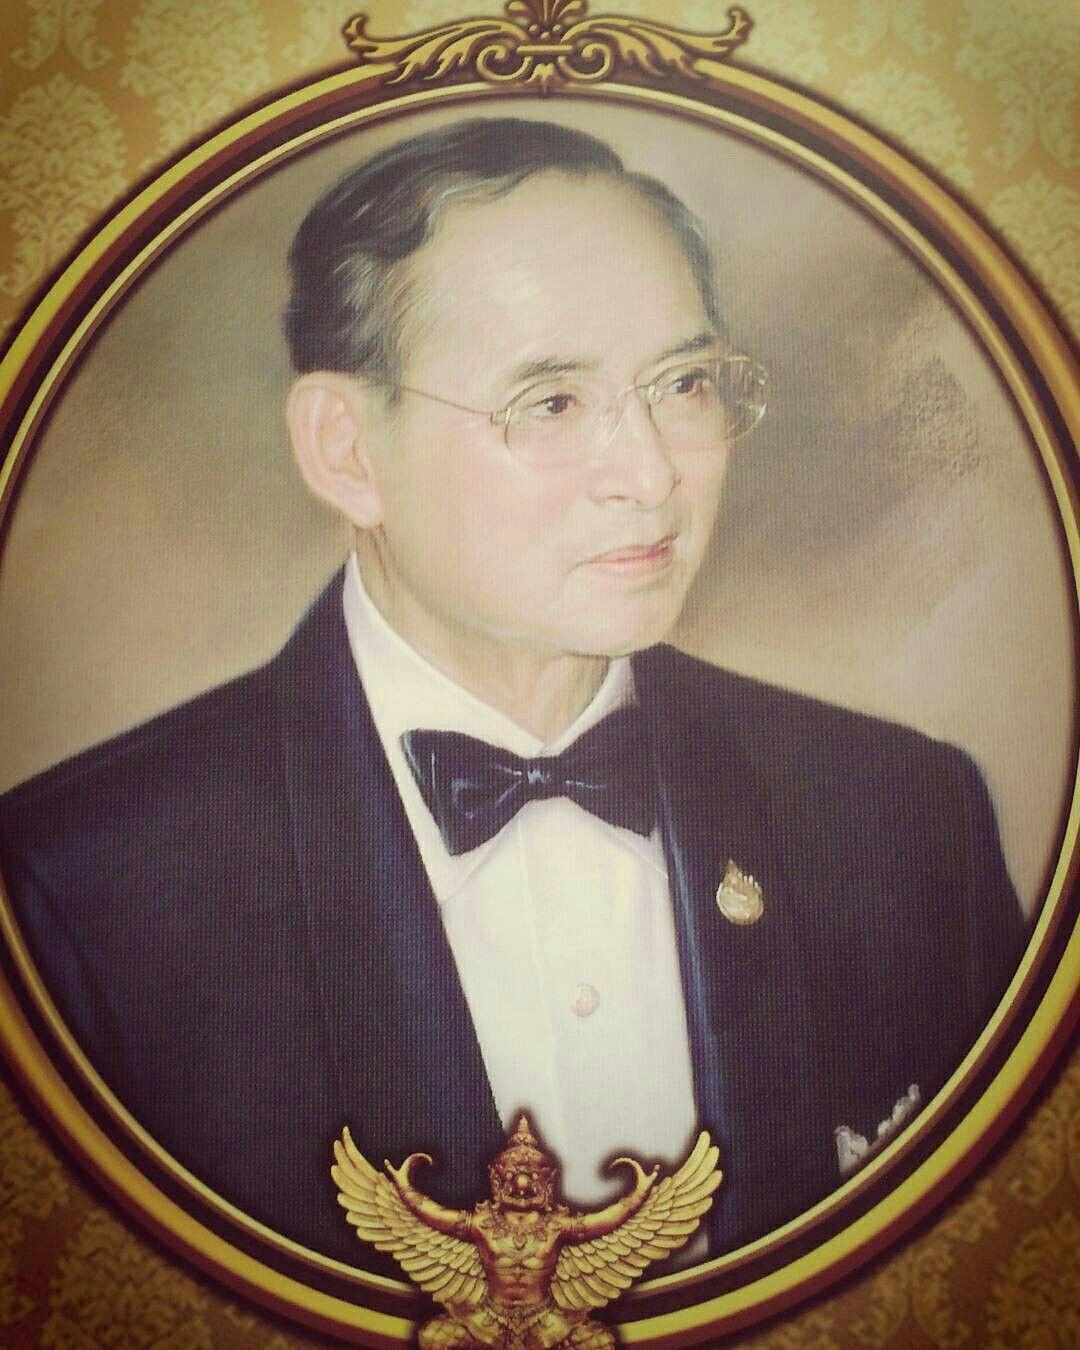 "@bangkok_collection  -  "" 🙏🙏🙏 ข้าพระพุทธเจ้าขอกราบส่งเสด็จสู่สวรรคาลัย 🙏🙏🙏 "" 😥😥😥😥😥😥😥😥😥😥😥😥😥😥😥😥😥 #ขอเป็นข้ารองพระบาททุกชาติไป#ส่งเสด็จสู่สวรรคาลัย - #regrann"